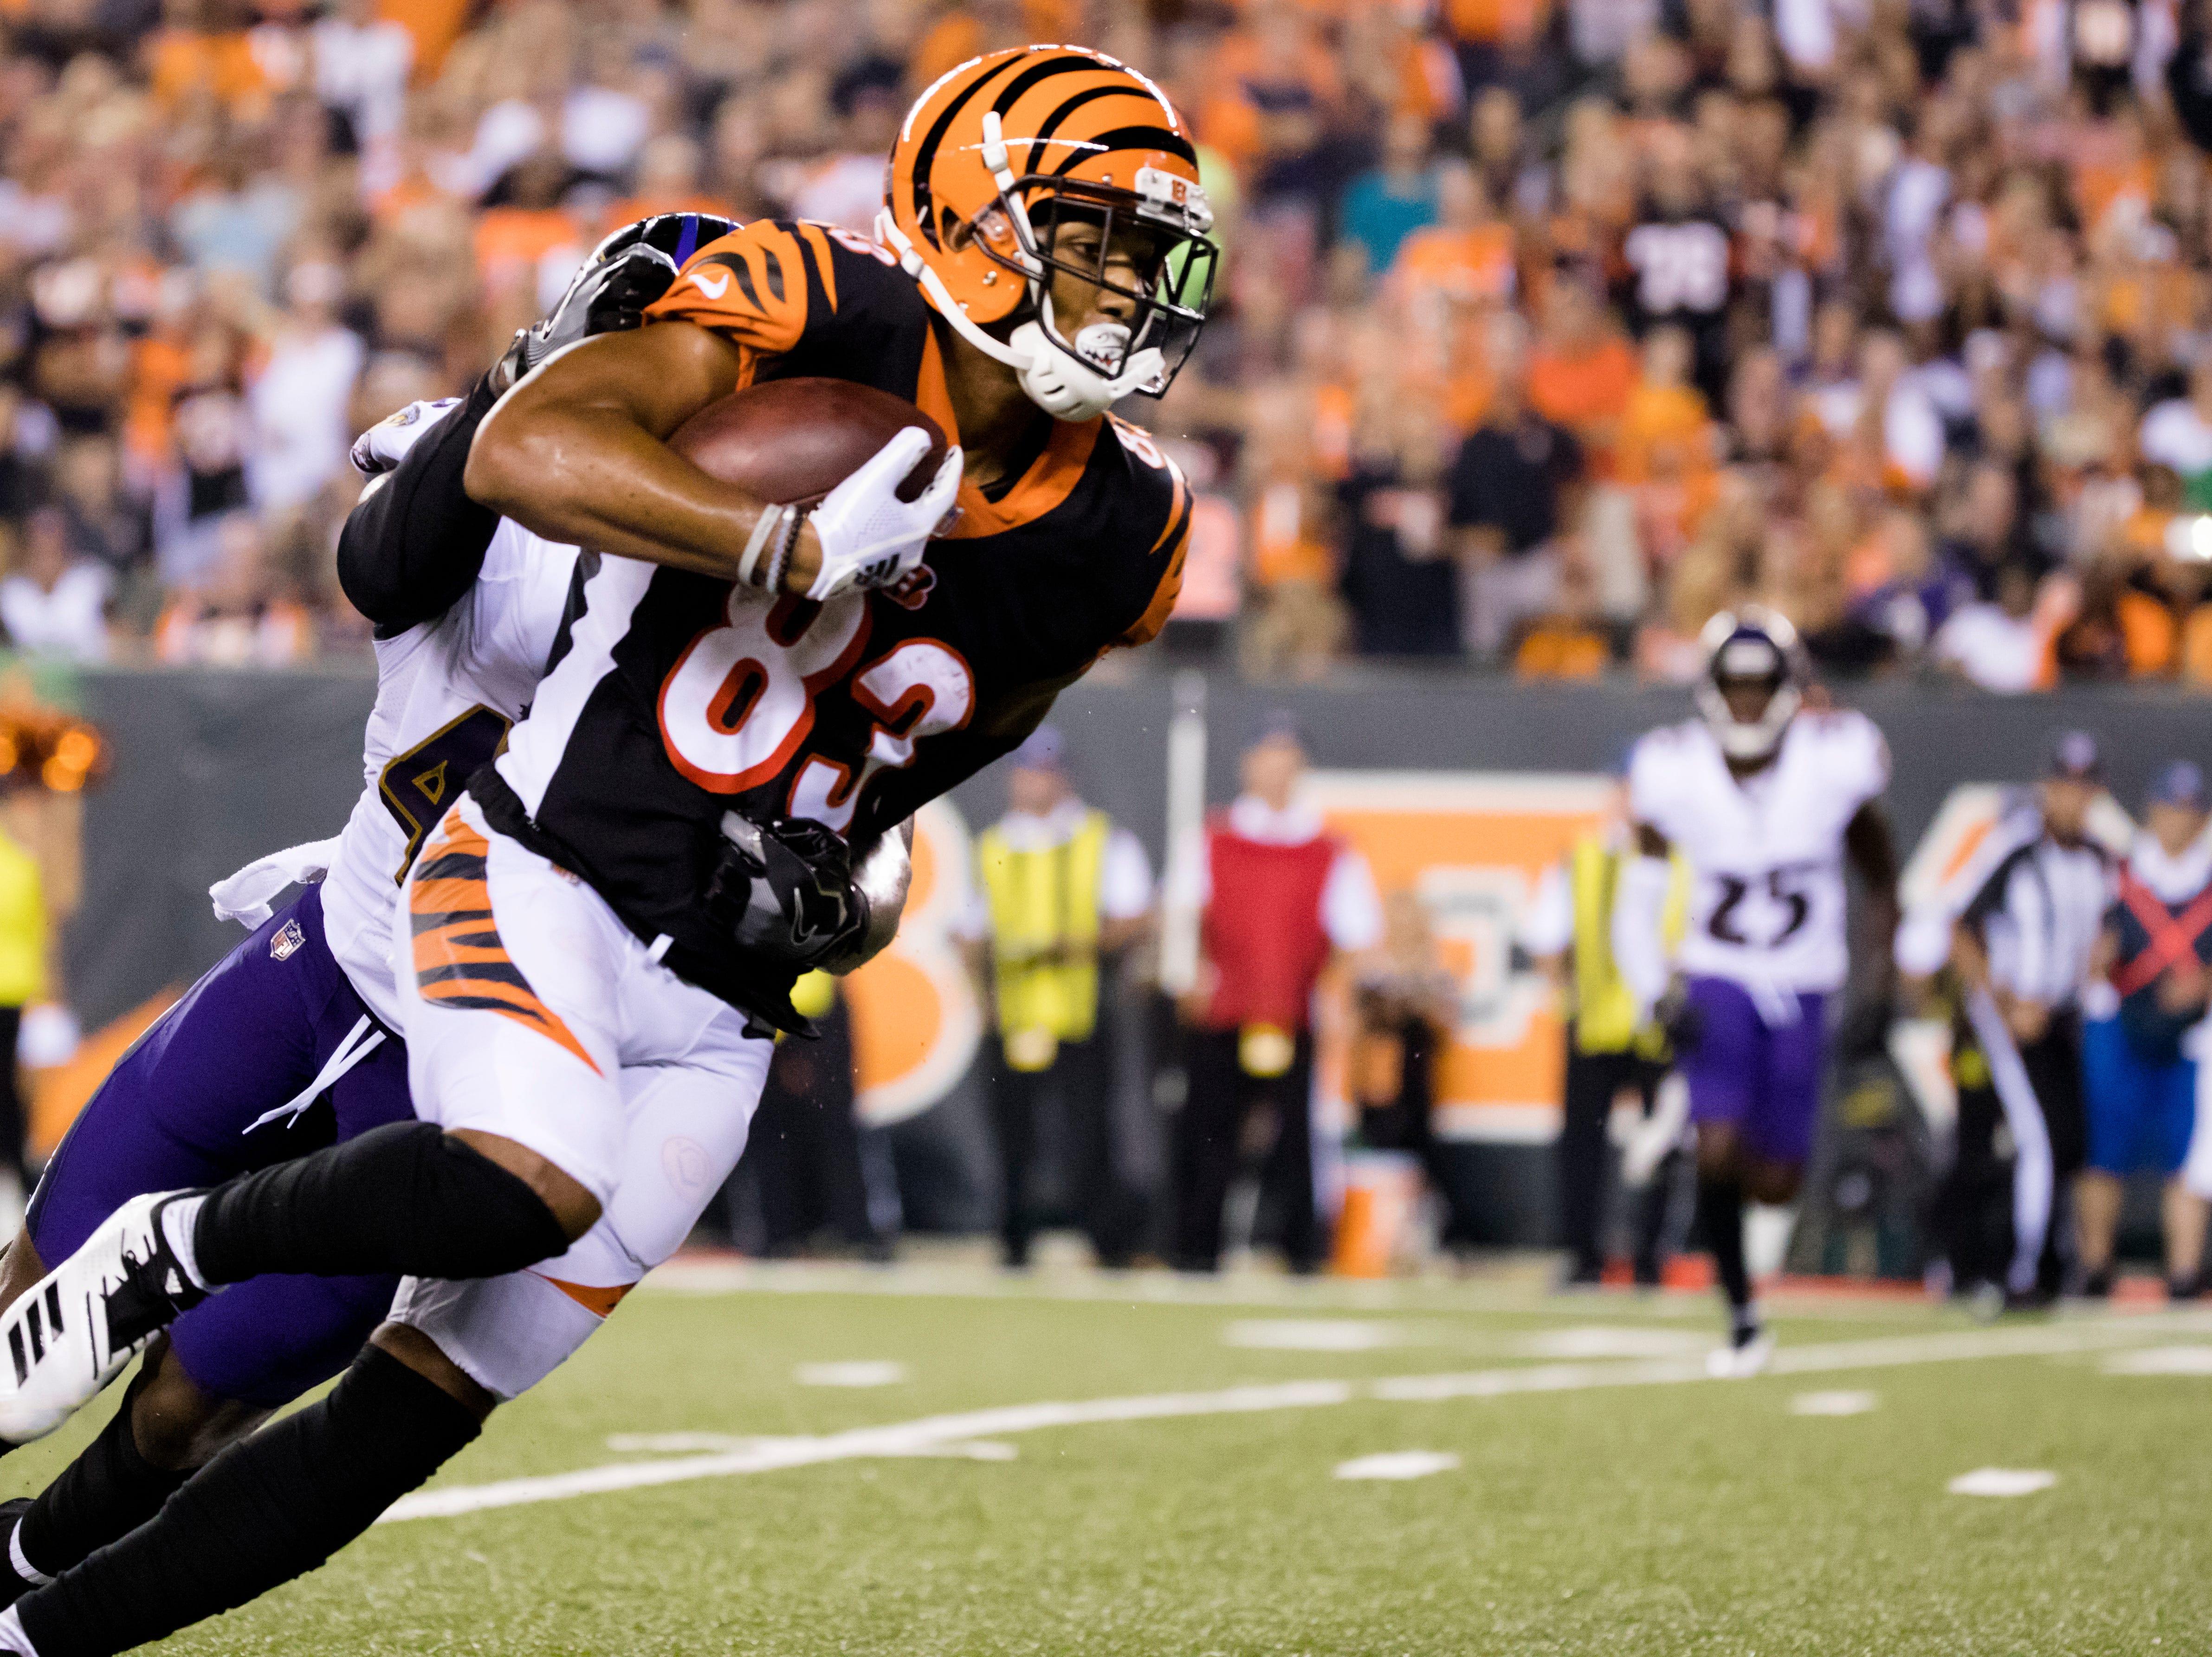 Cincinnati Bengals wide receiver Tyler Boyd (83) slips a tackle attempt by Baltimore Ravens linebacker Patrick Onwuasor (48) before scoring a touchdown during the Week 2 NFL game between the Cincinnati Bengals and the Baltimore Ravens, Thursday, Sept. 13, 2018, at Paul Brown Stadium in Cincinnati.